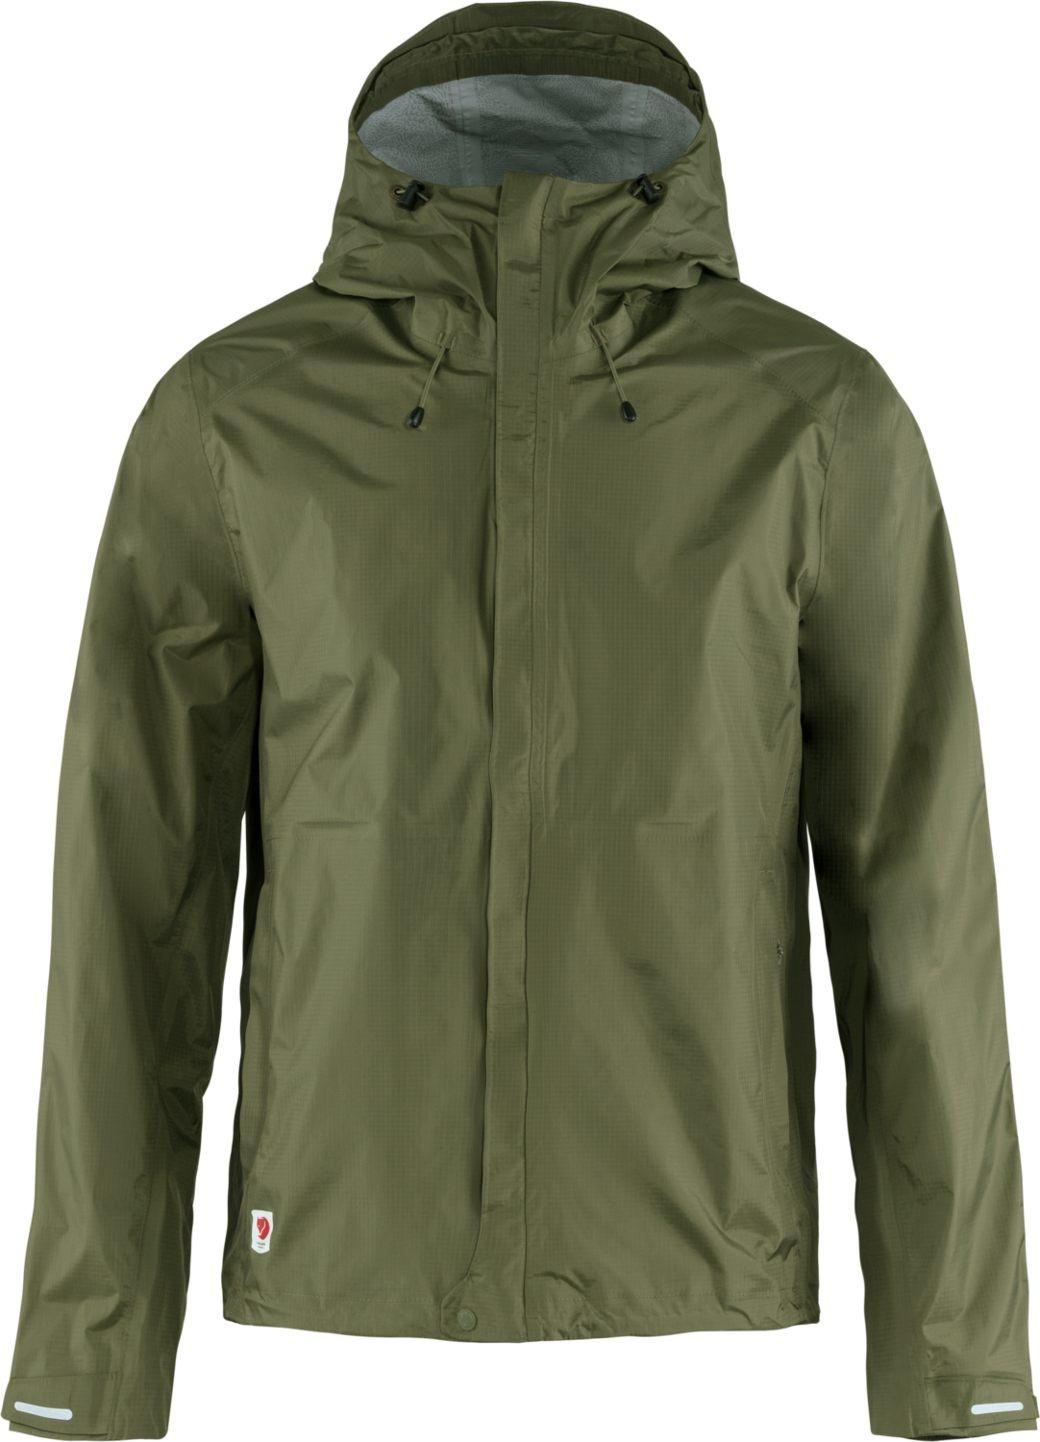 Fjällräven High Coast Hydratic Jacket M Green-1